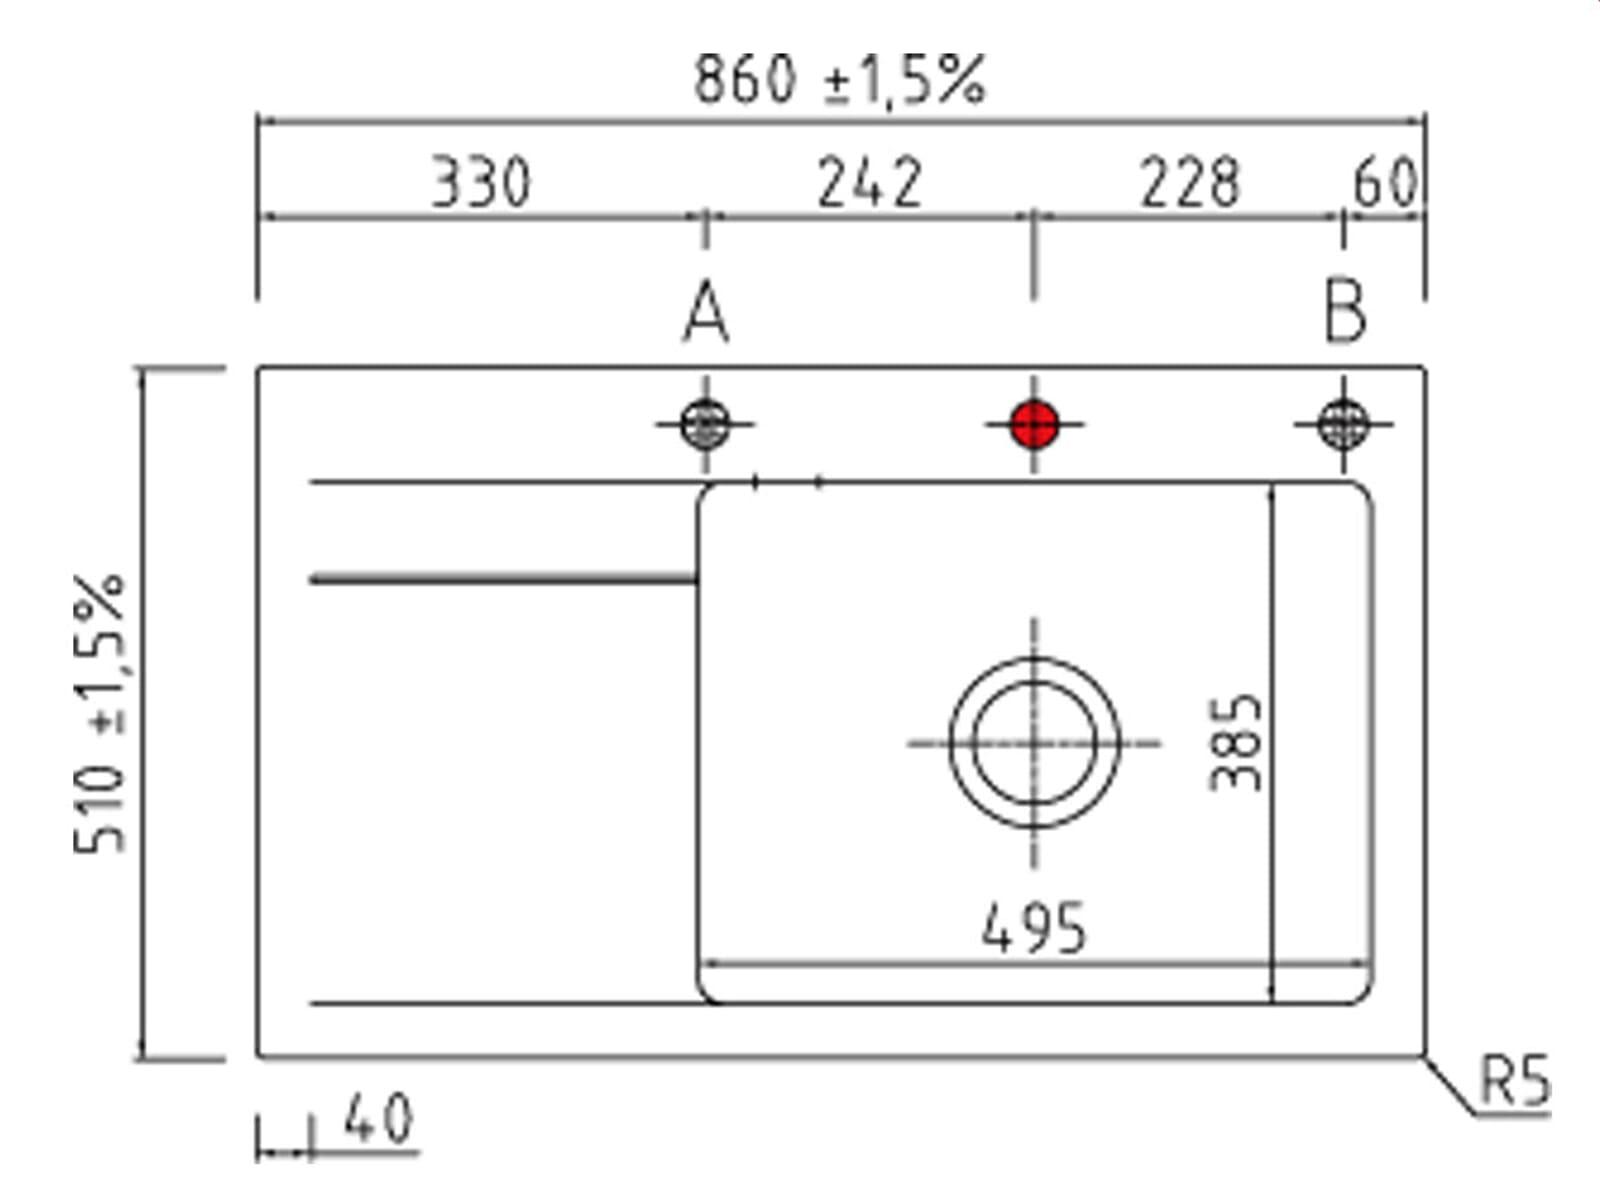 Systemceram Stema 86 SL Grönland Keramikspüle Excenterbetätigung